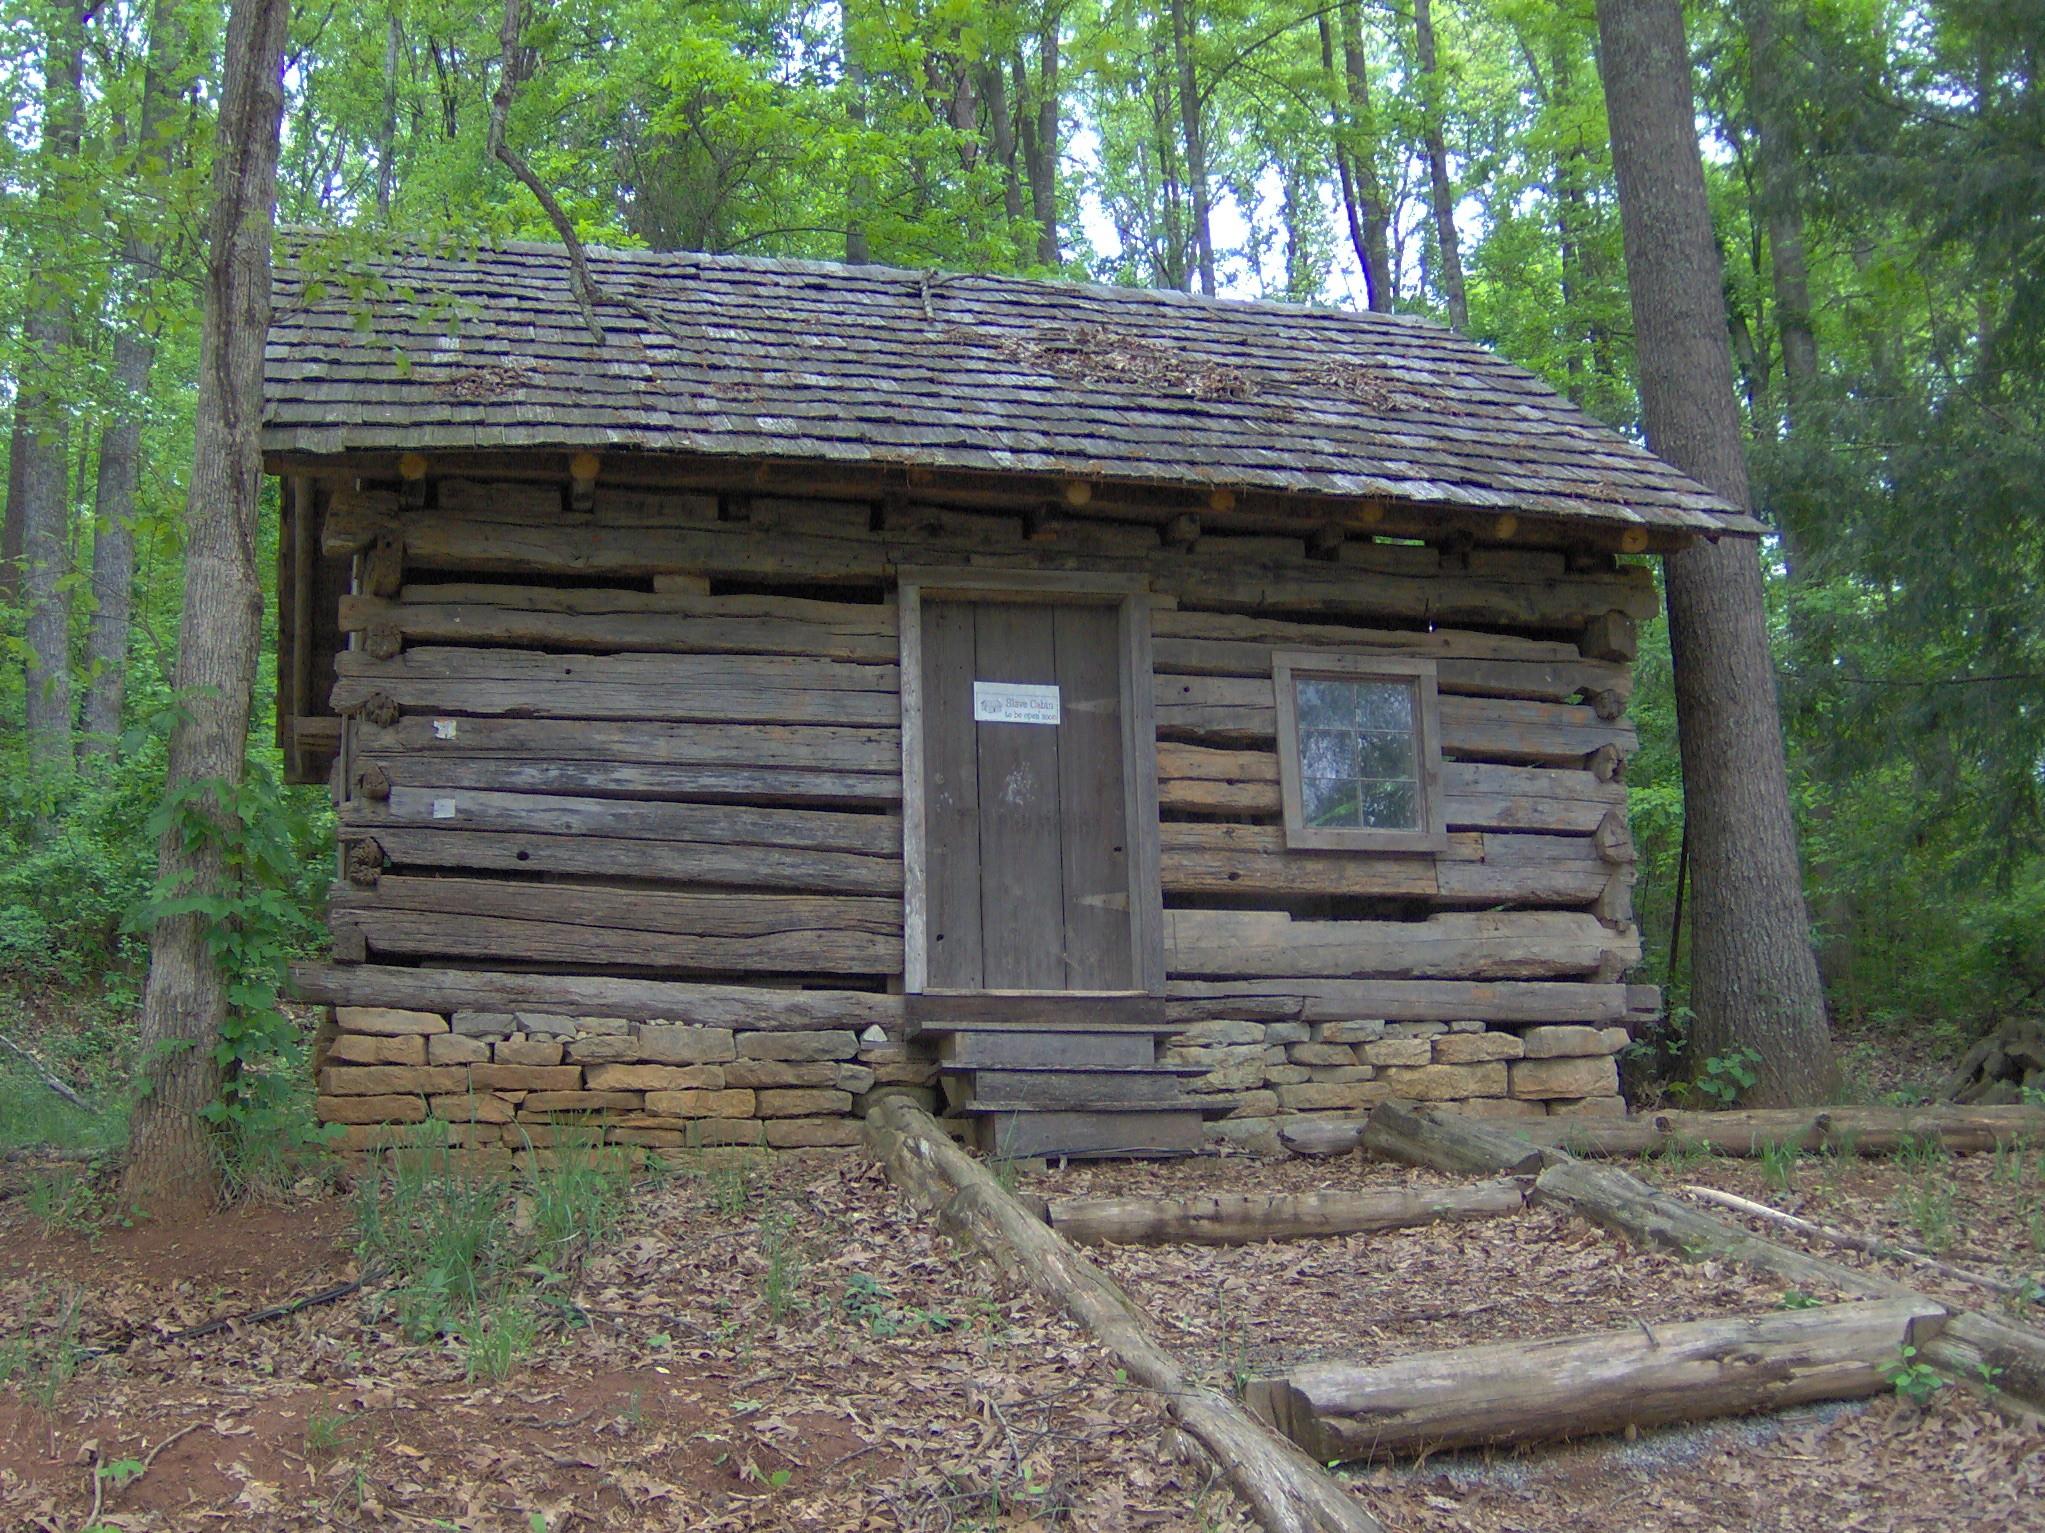 Http Commons Wikimedia Org Wiki File Slave Cabin Moa Tn1 Jpg